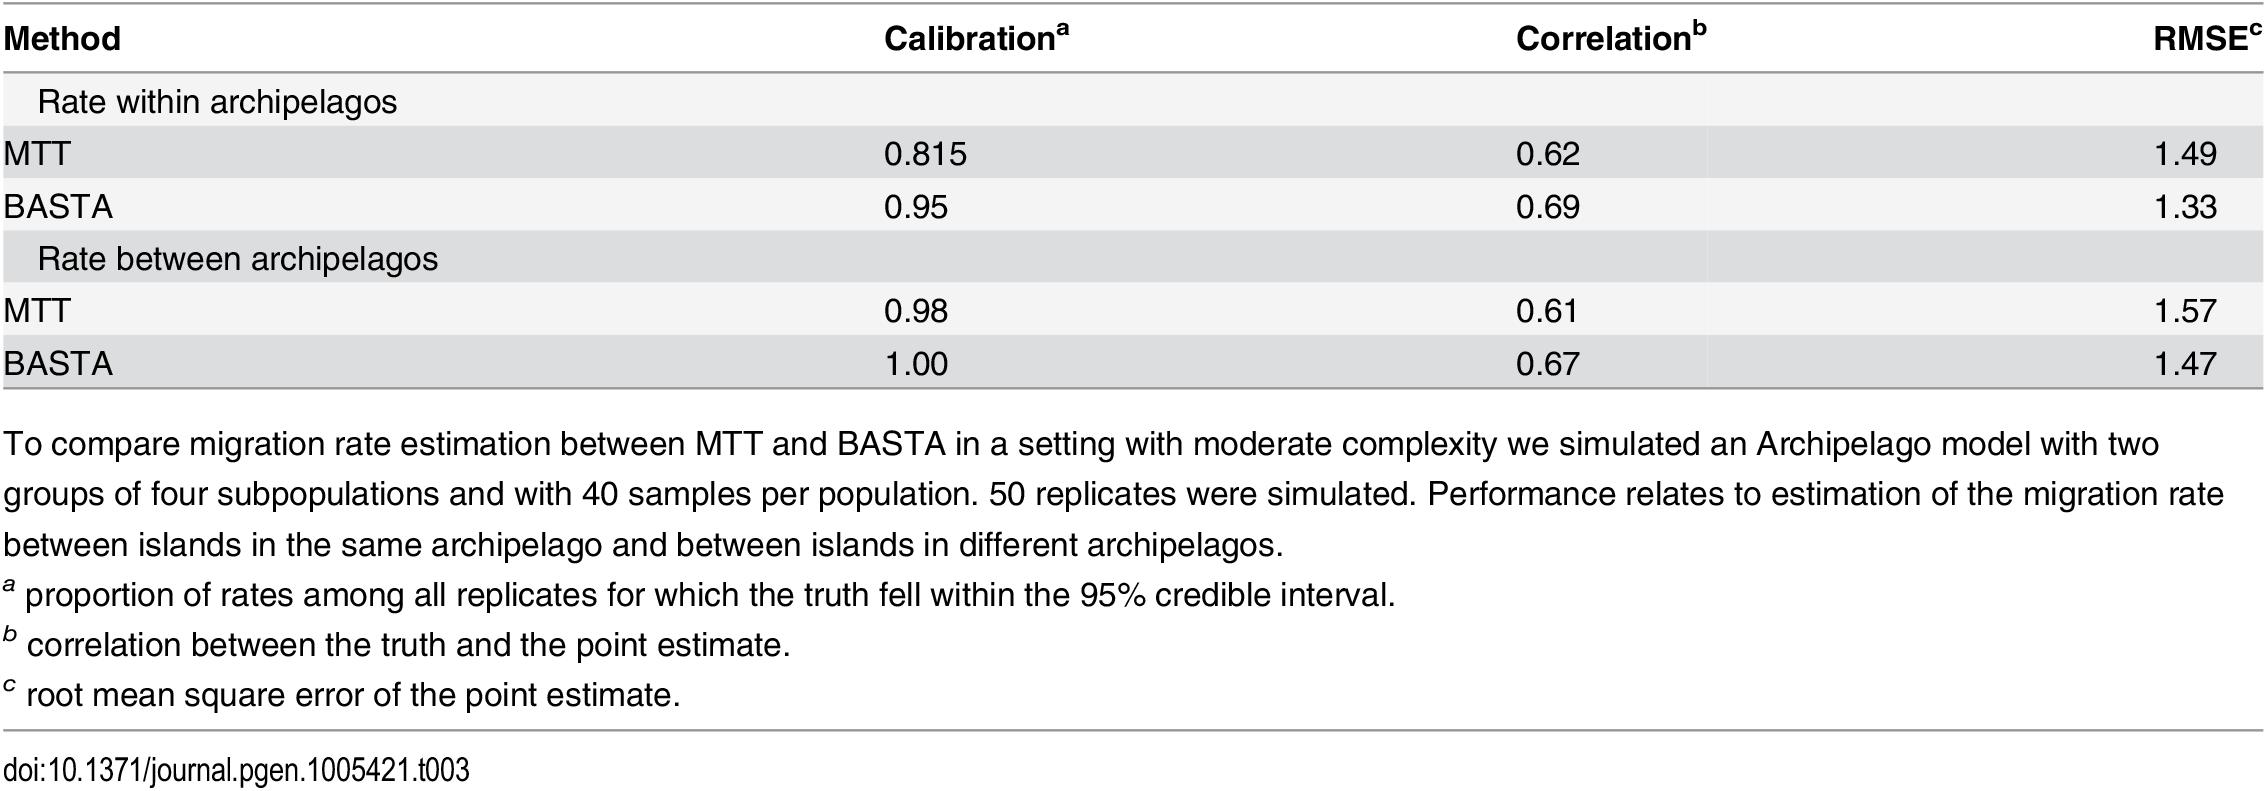 BASTA improves migration rate estimation in the Archipelago scenario.